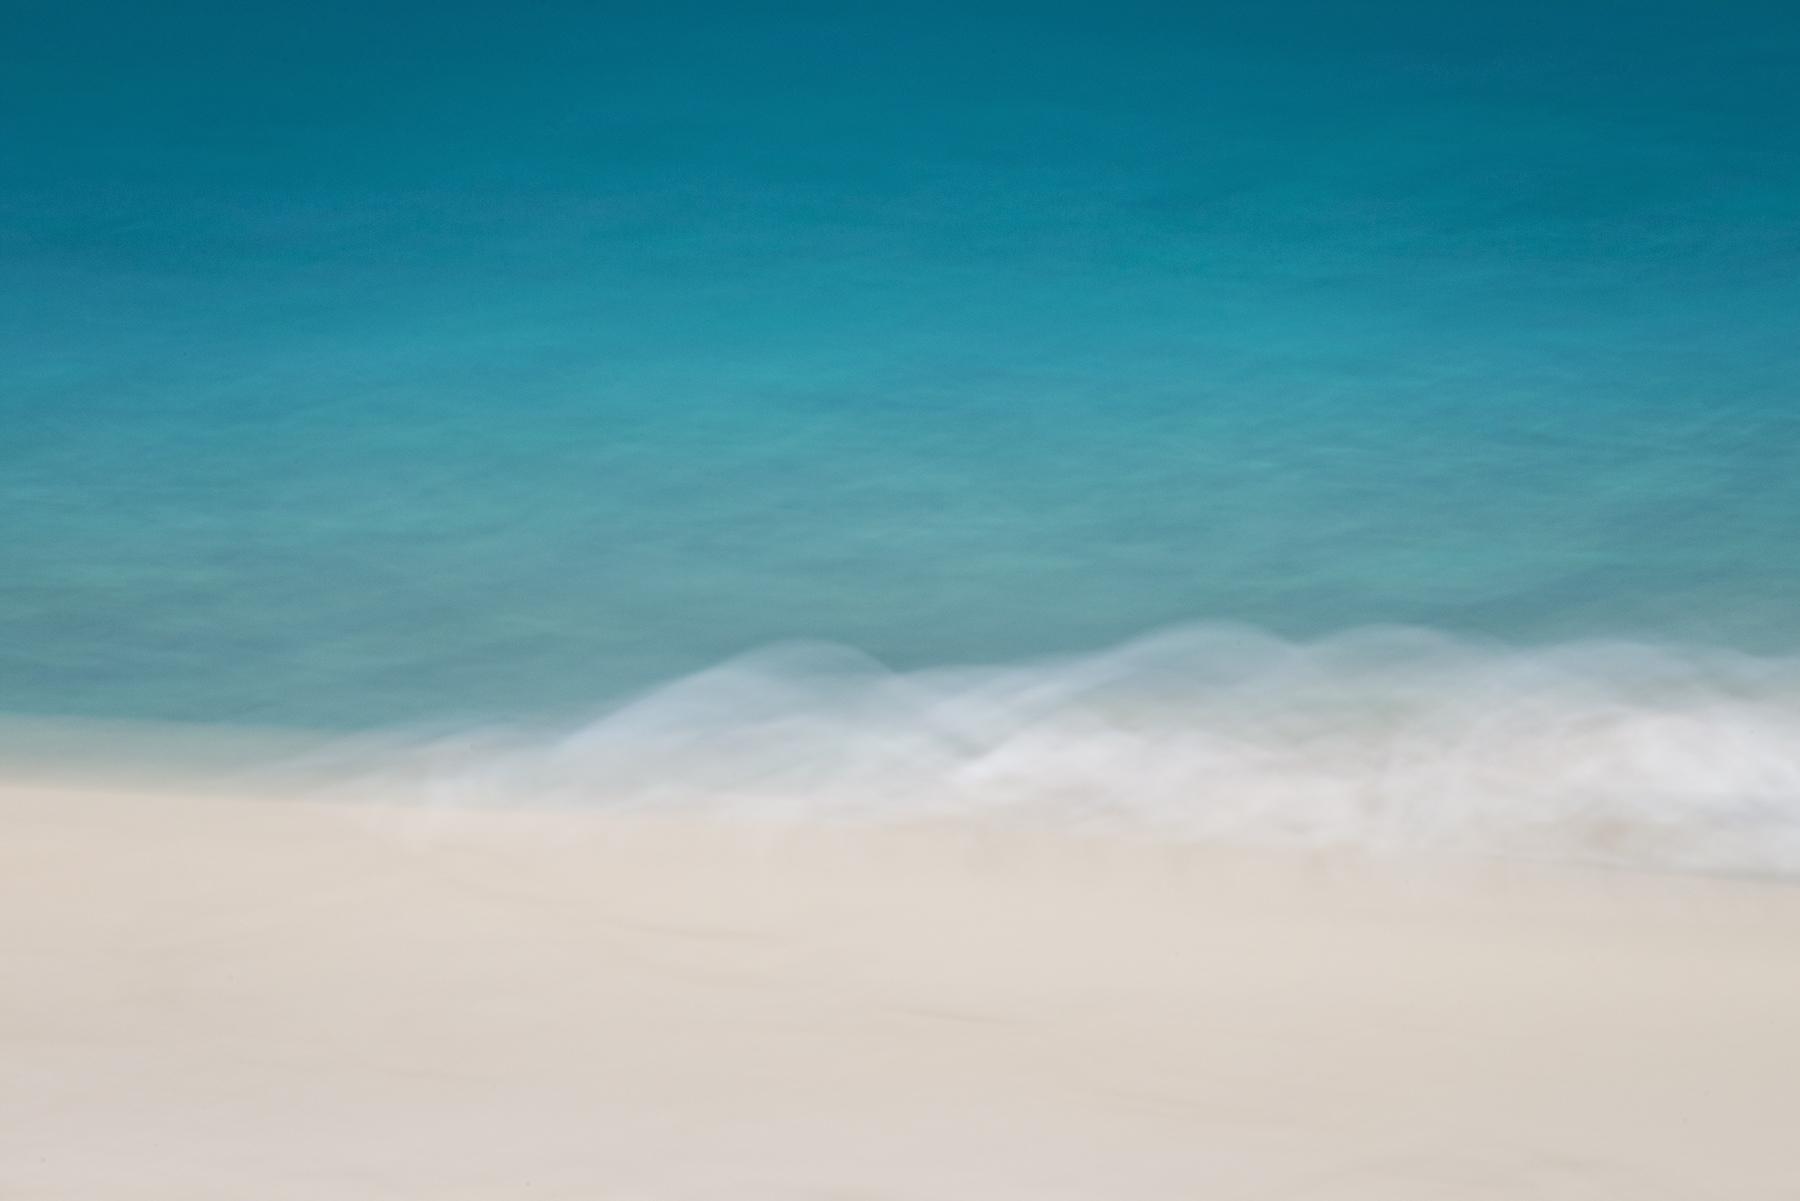 St. Barths Waves 9025